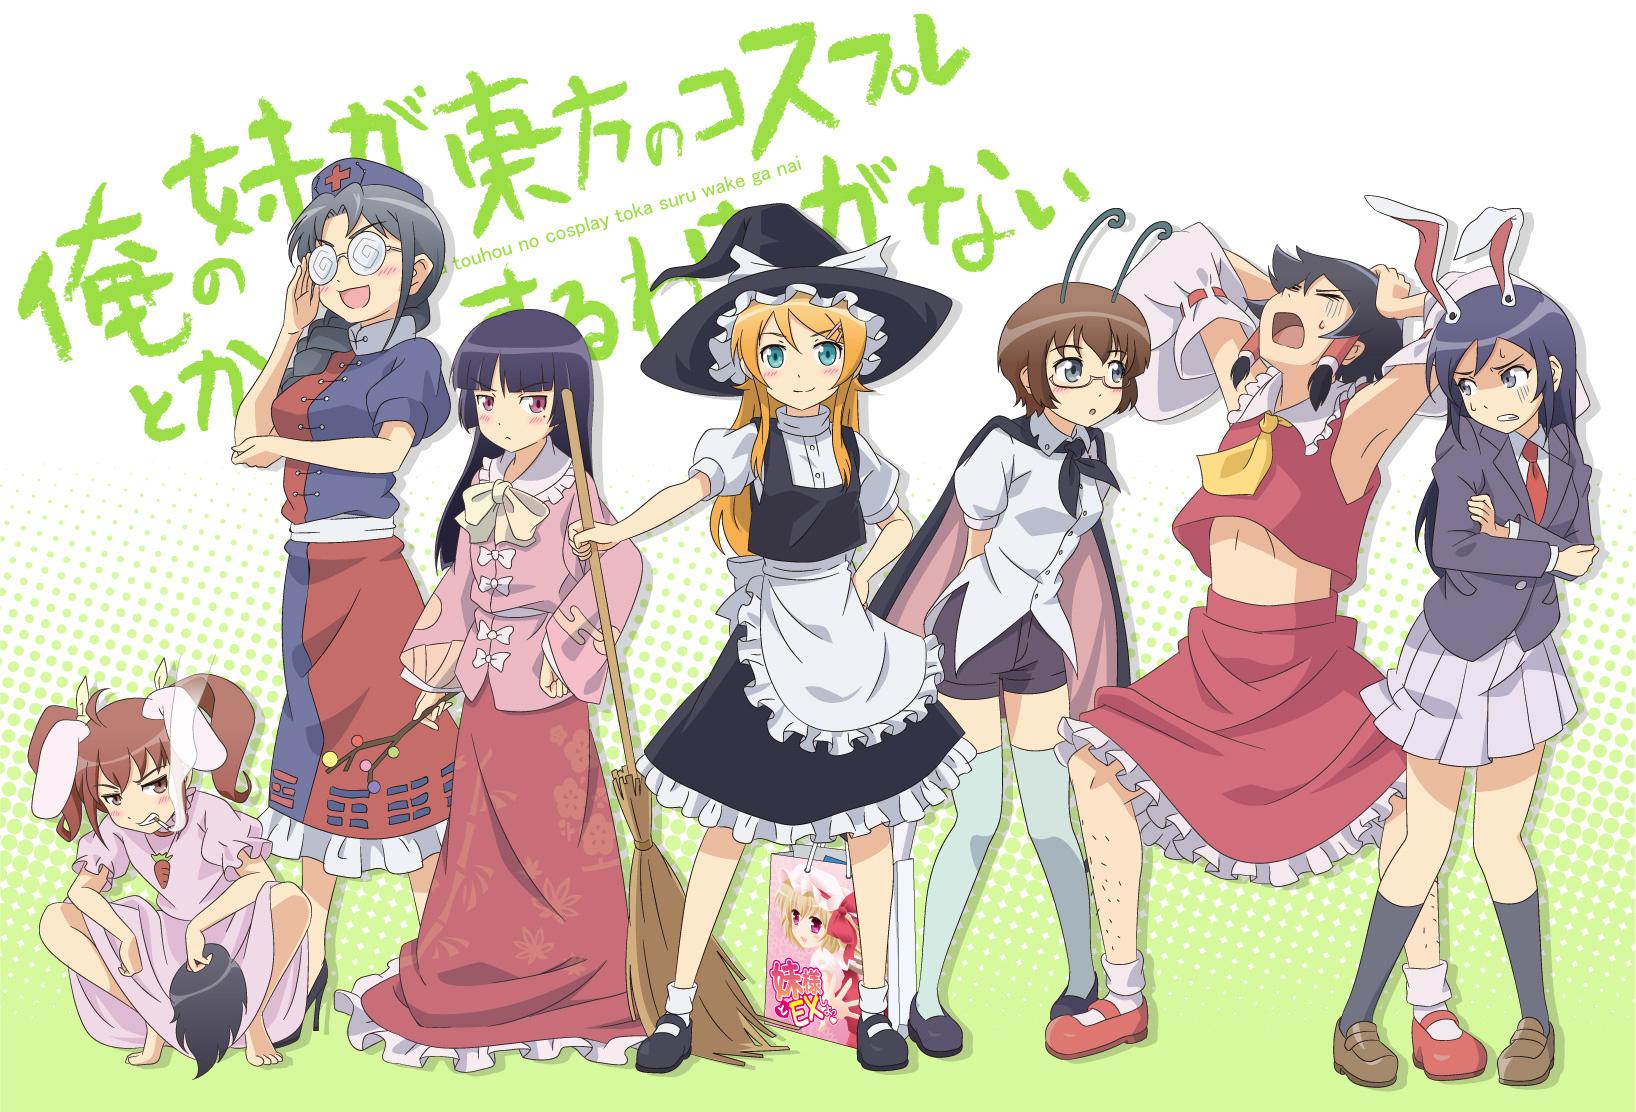 aliasing aragaki ayase bunnygirl cosplay gokou ruri ...  aliasing aragak...